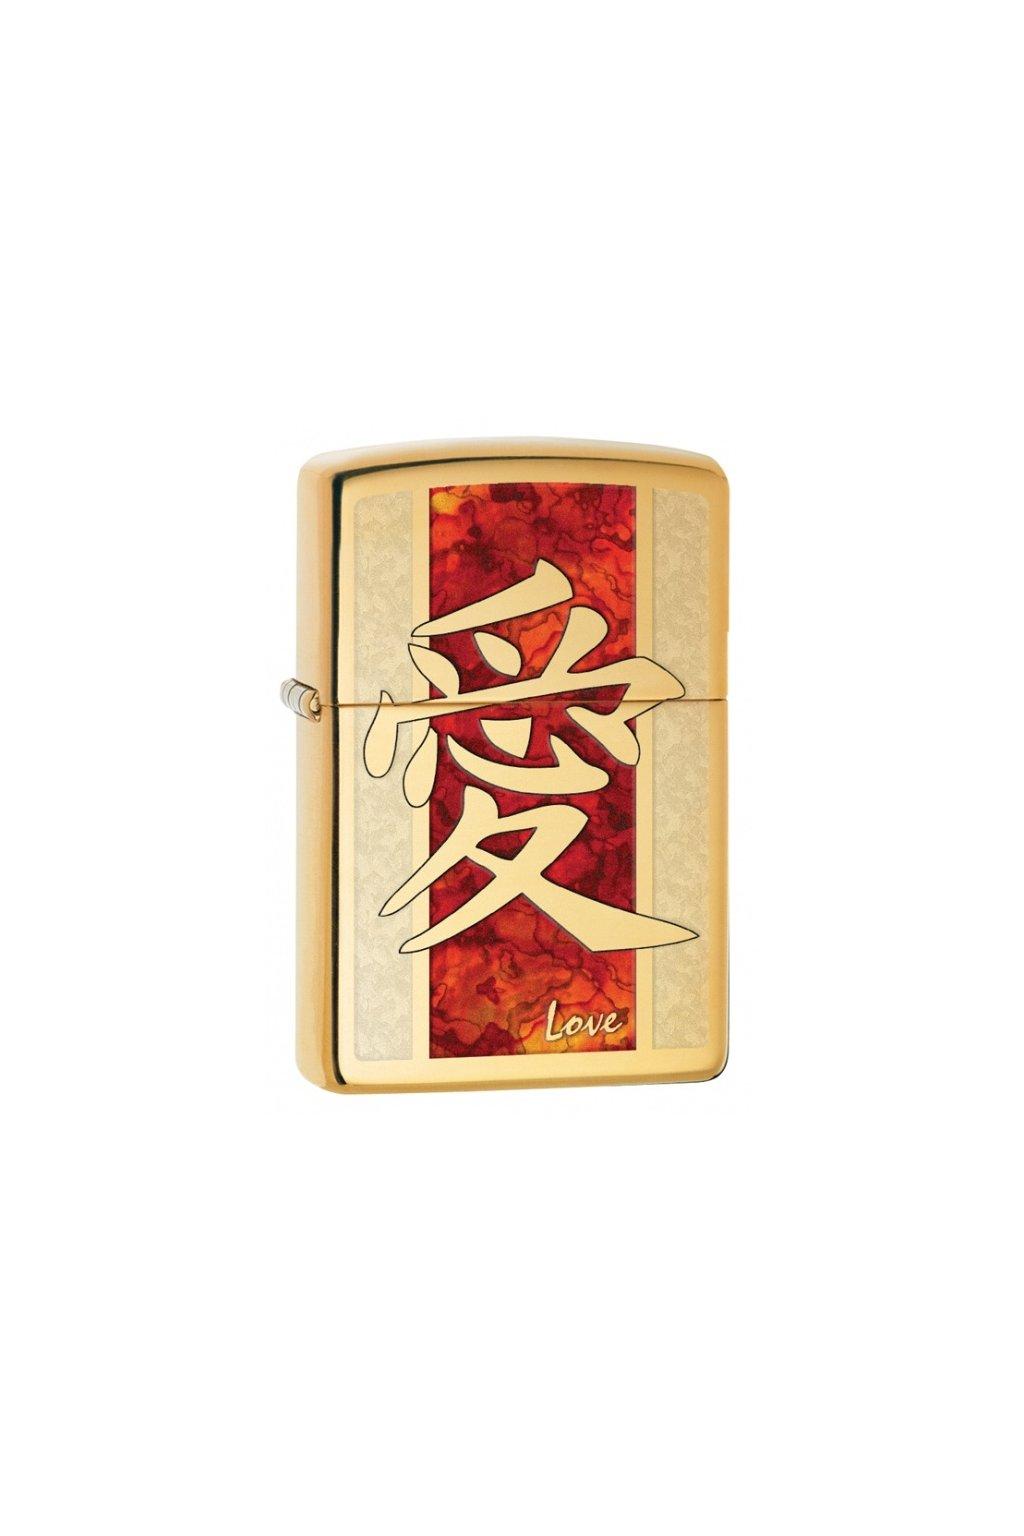 93548 zippo zapalovac 24185 chinese love